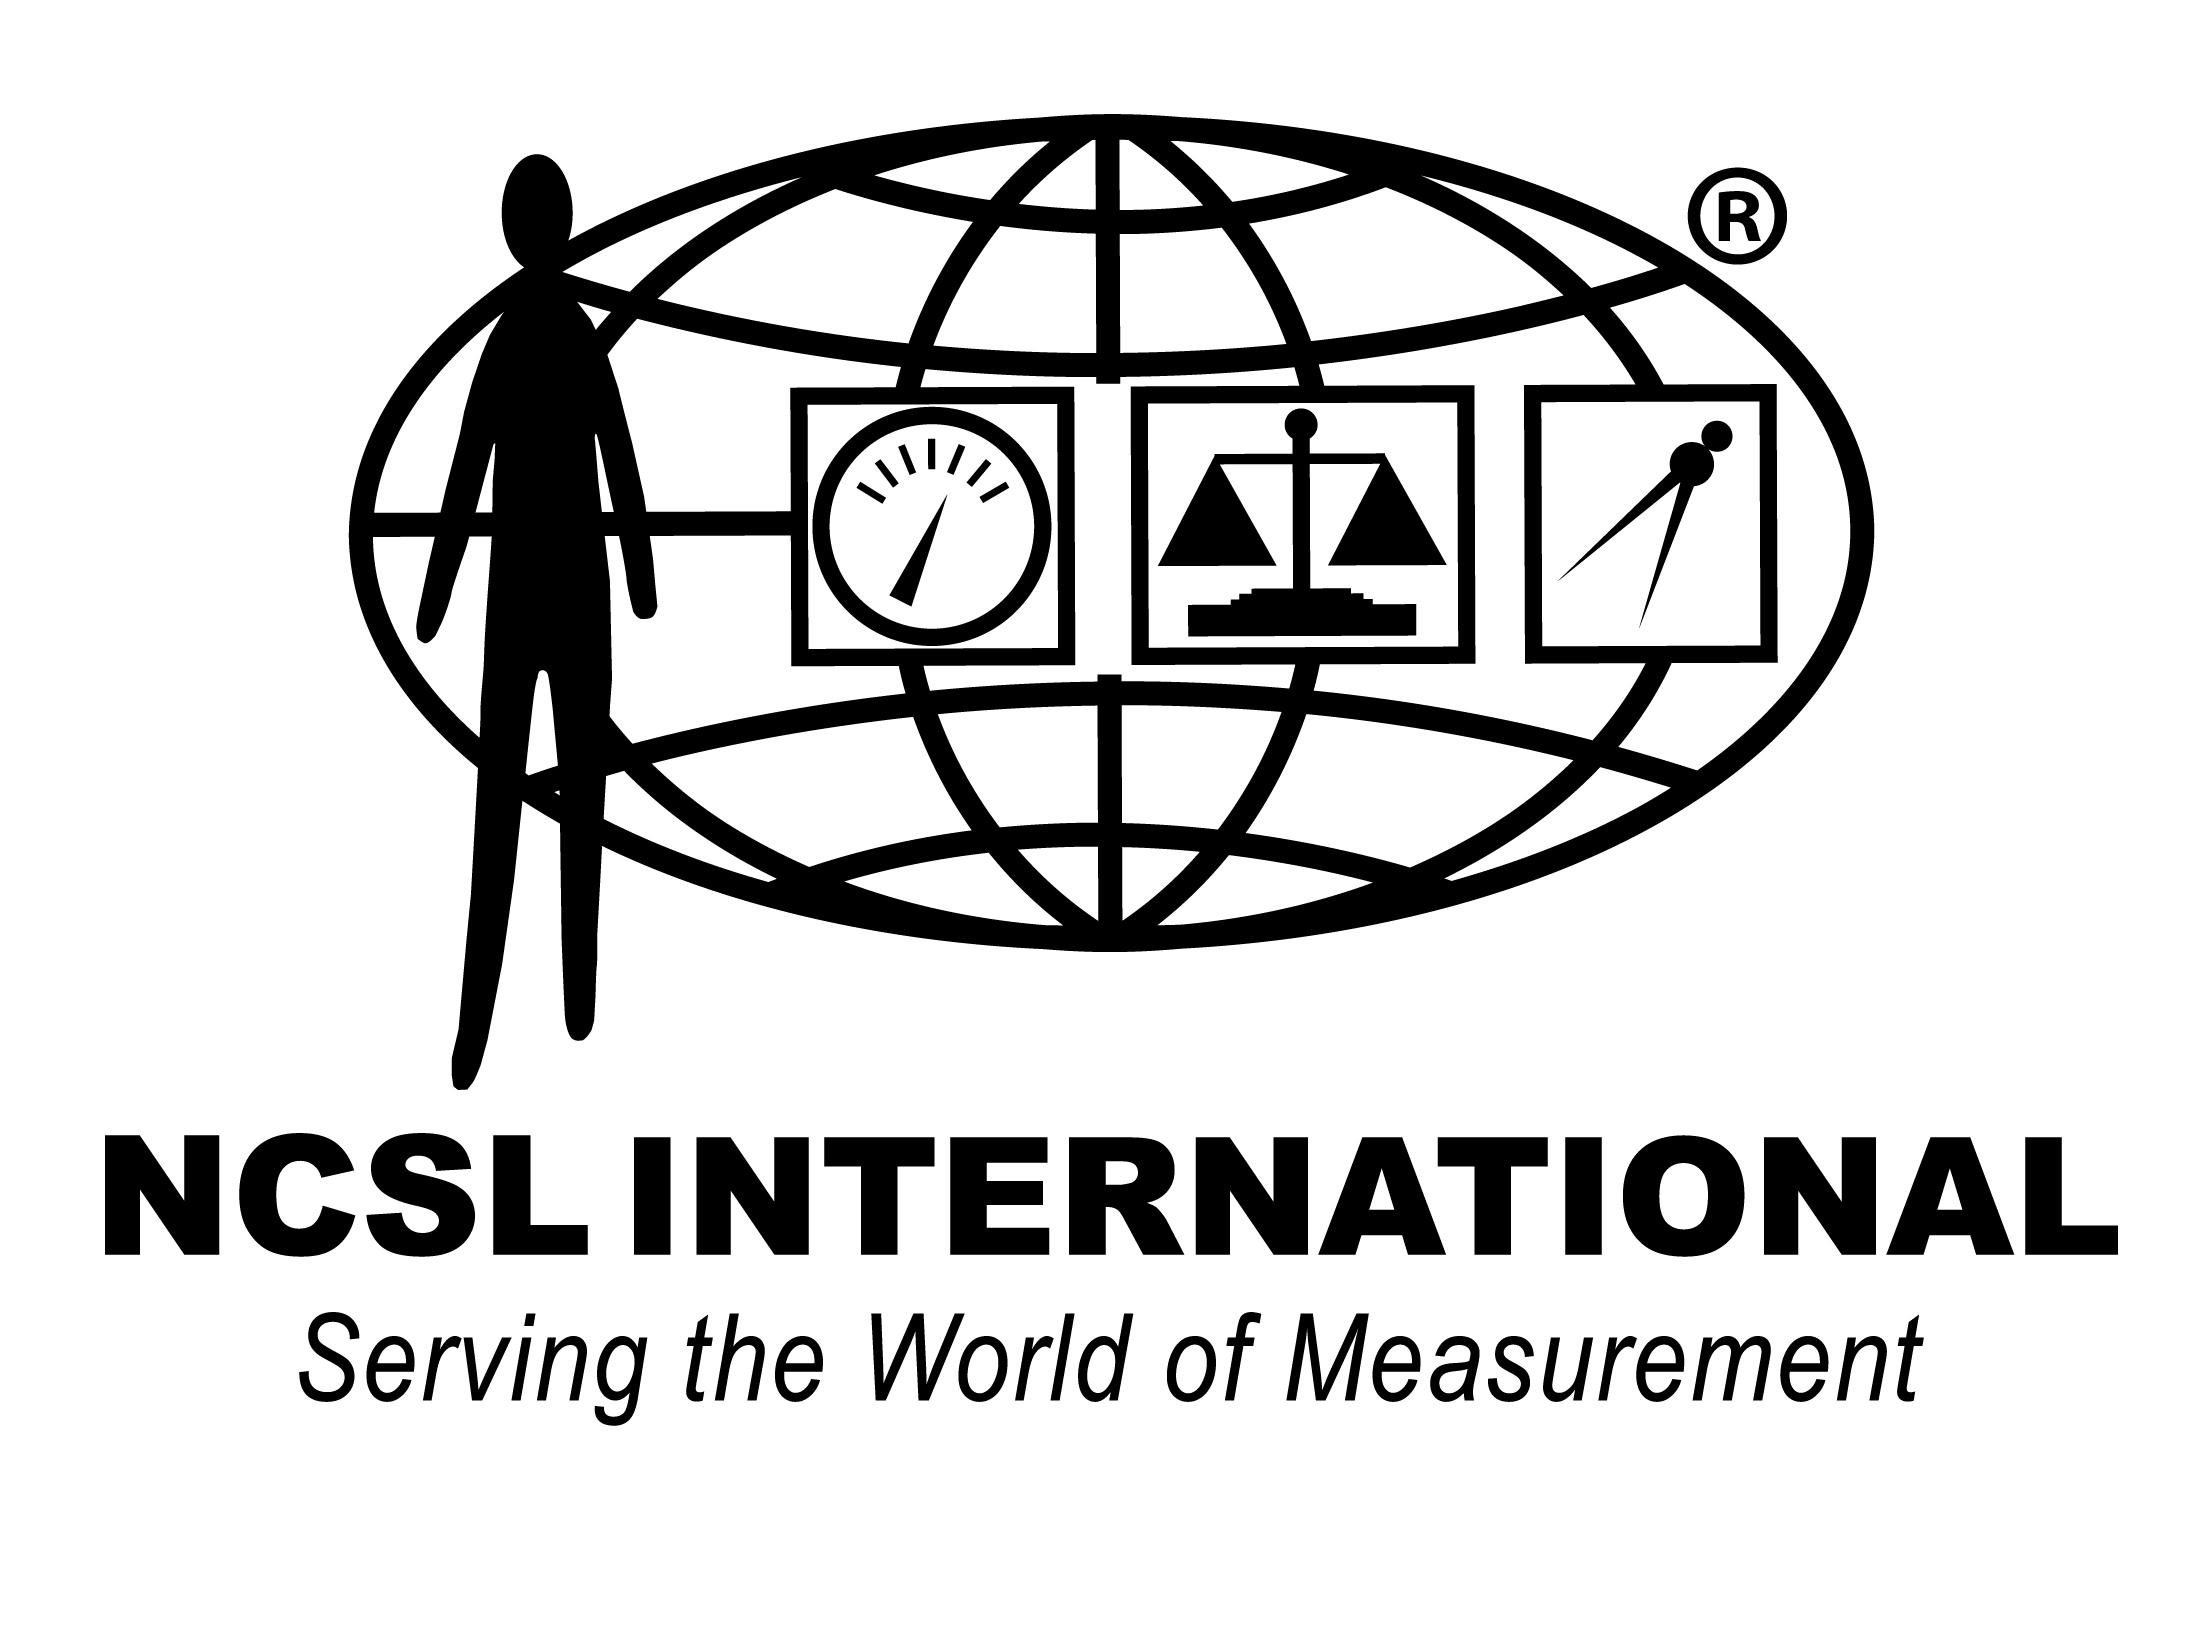 NCSL International